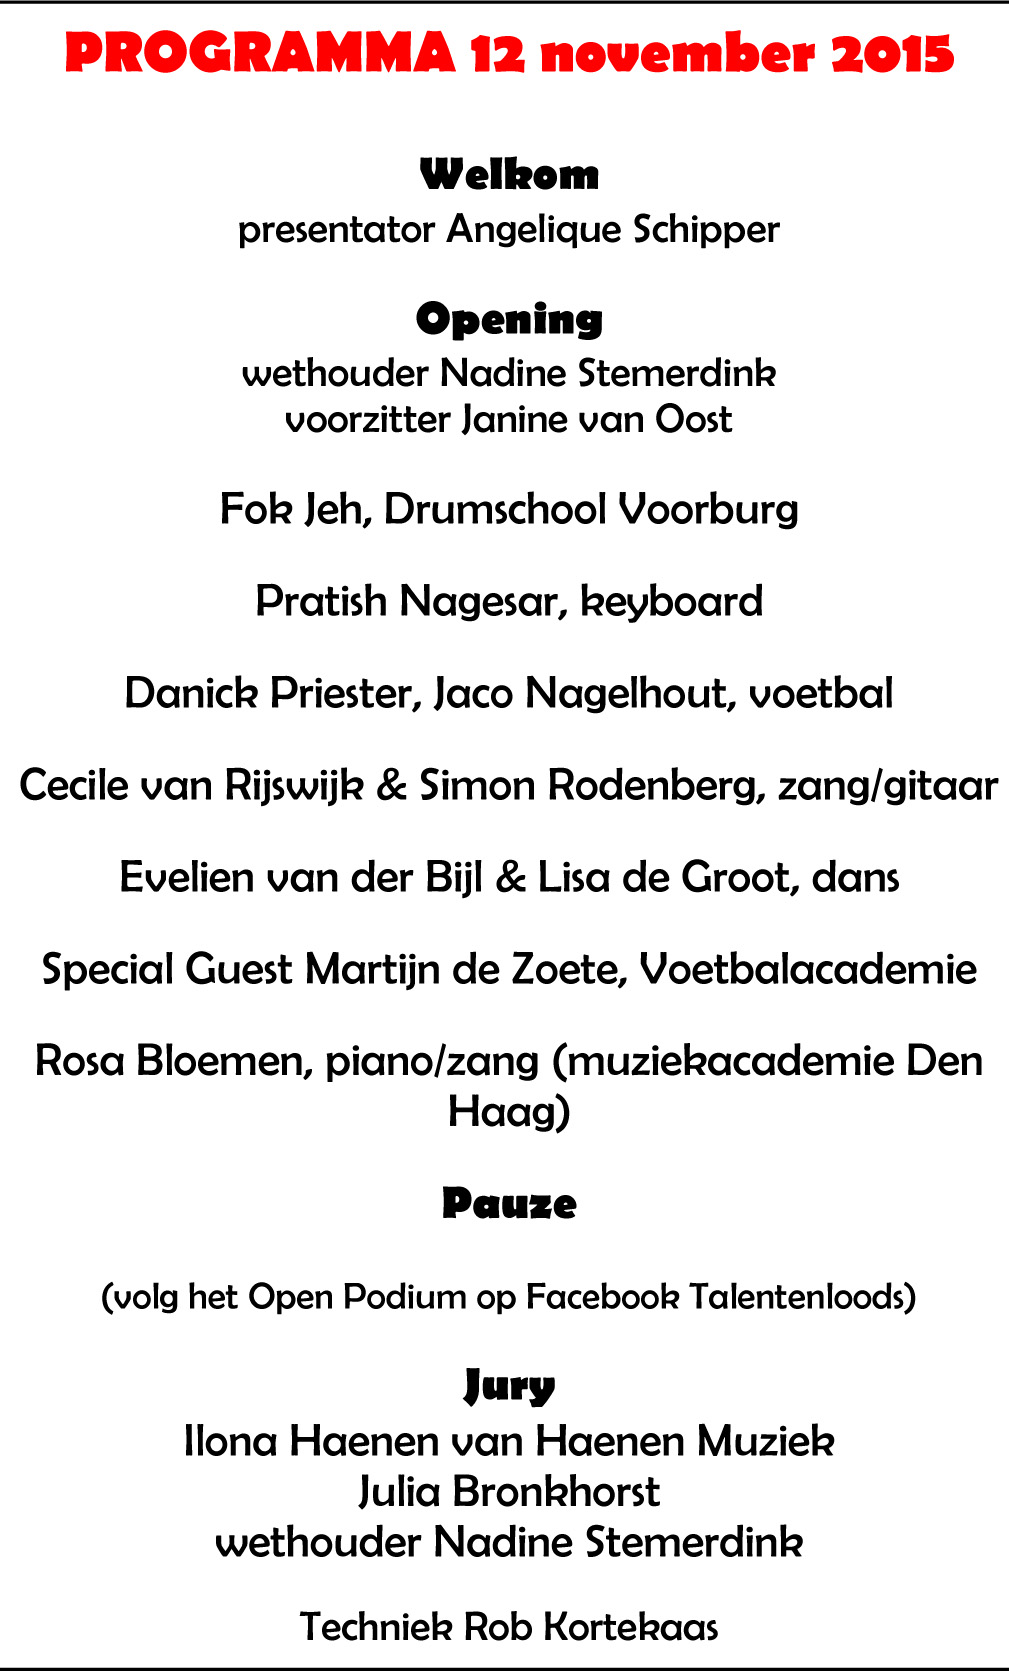 Programma Open Podium 12-11-2015